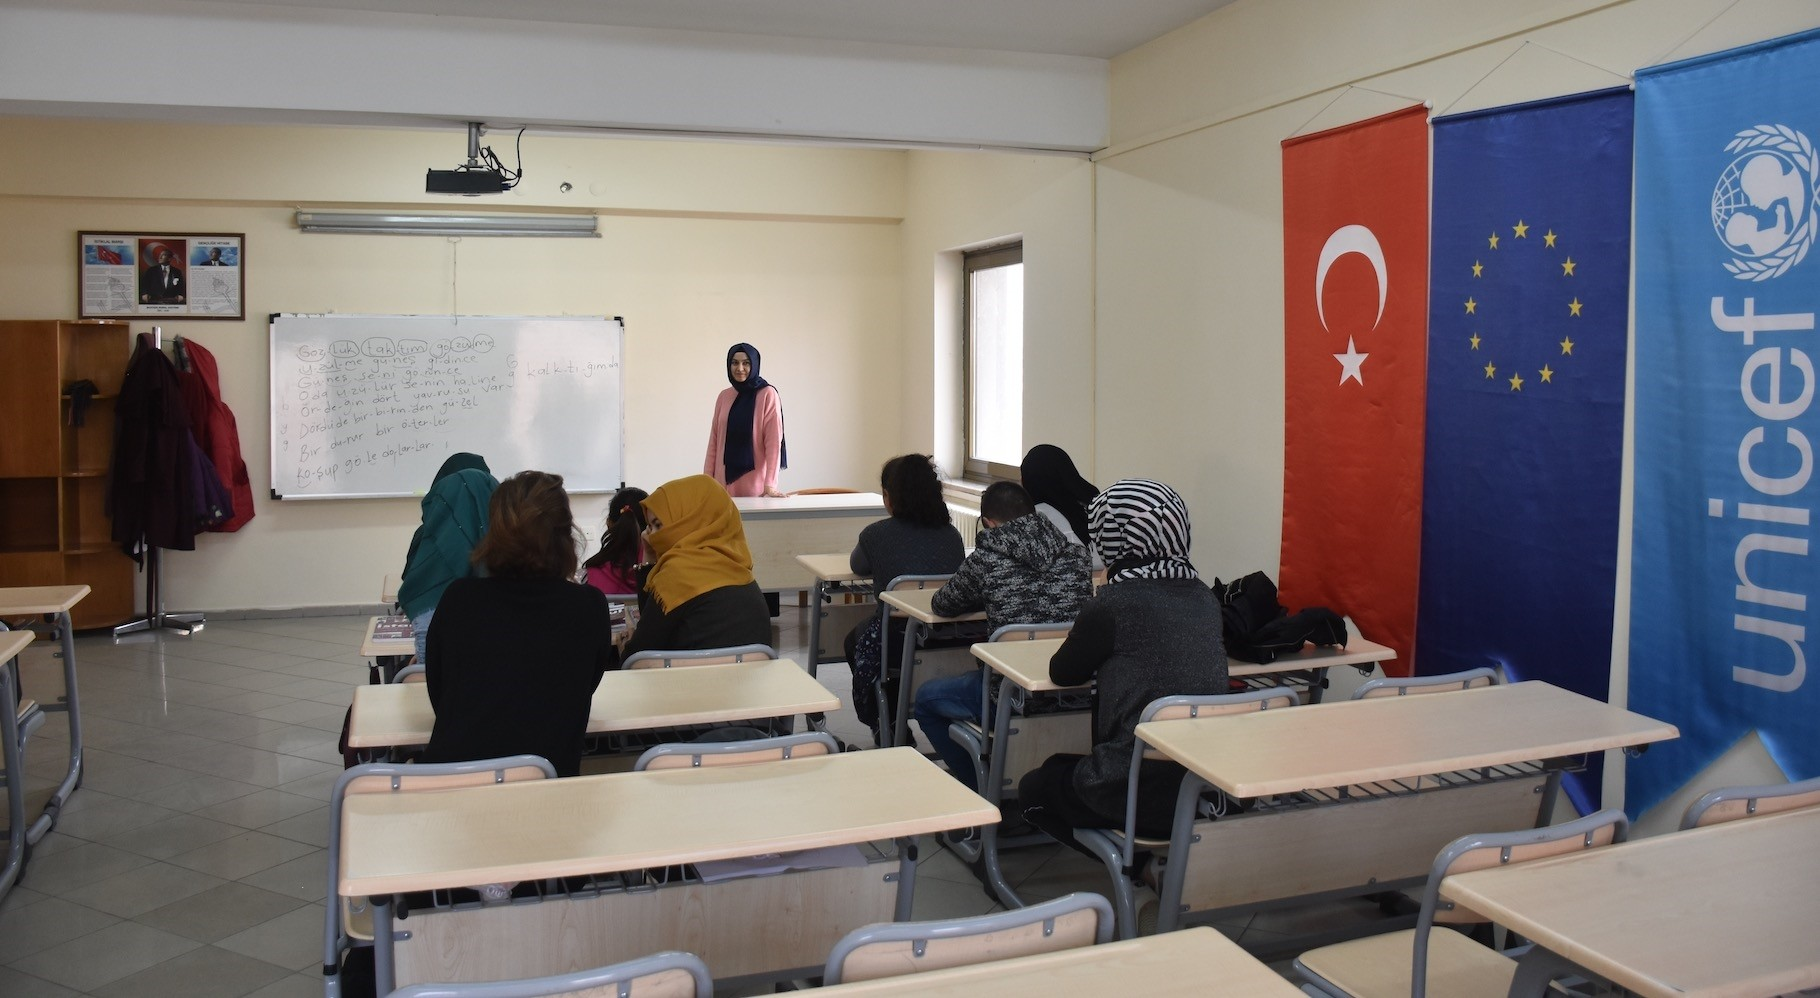 Syrian and Iraqi children attend a class in Mamak, Ankara on Jan. 20, 2019.